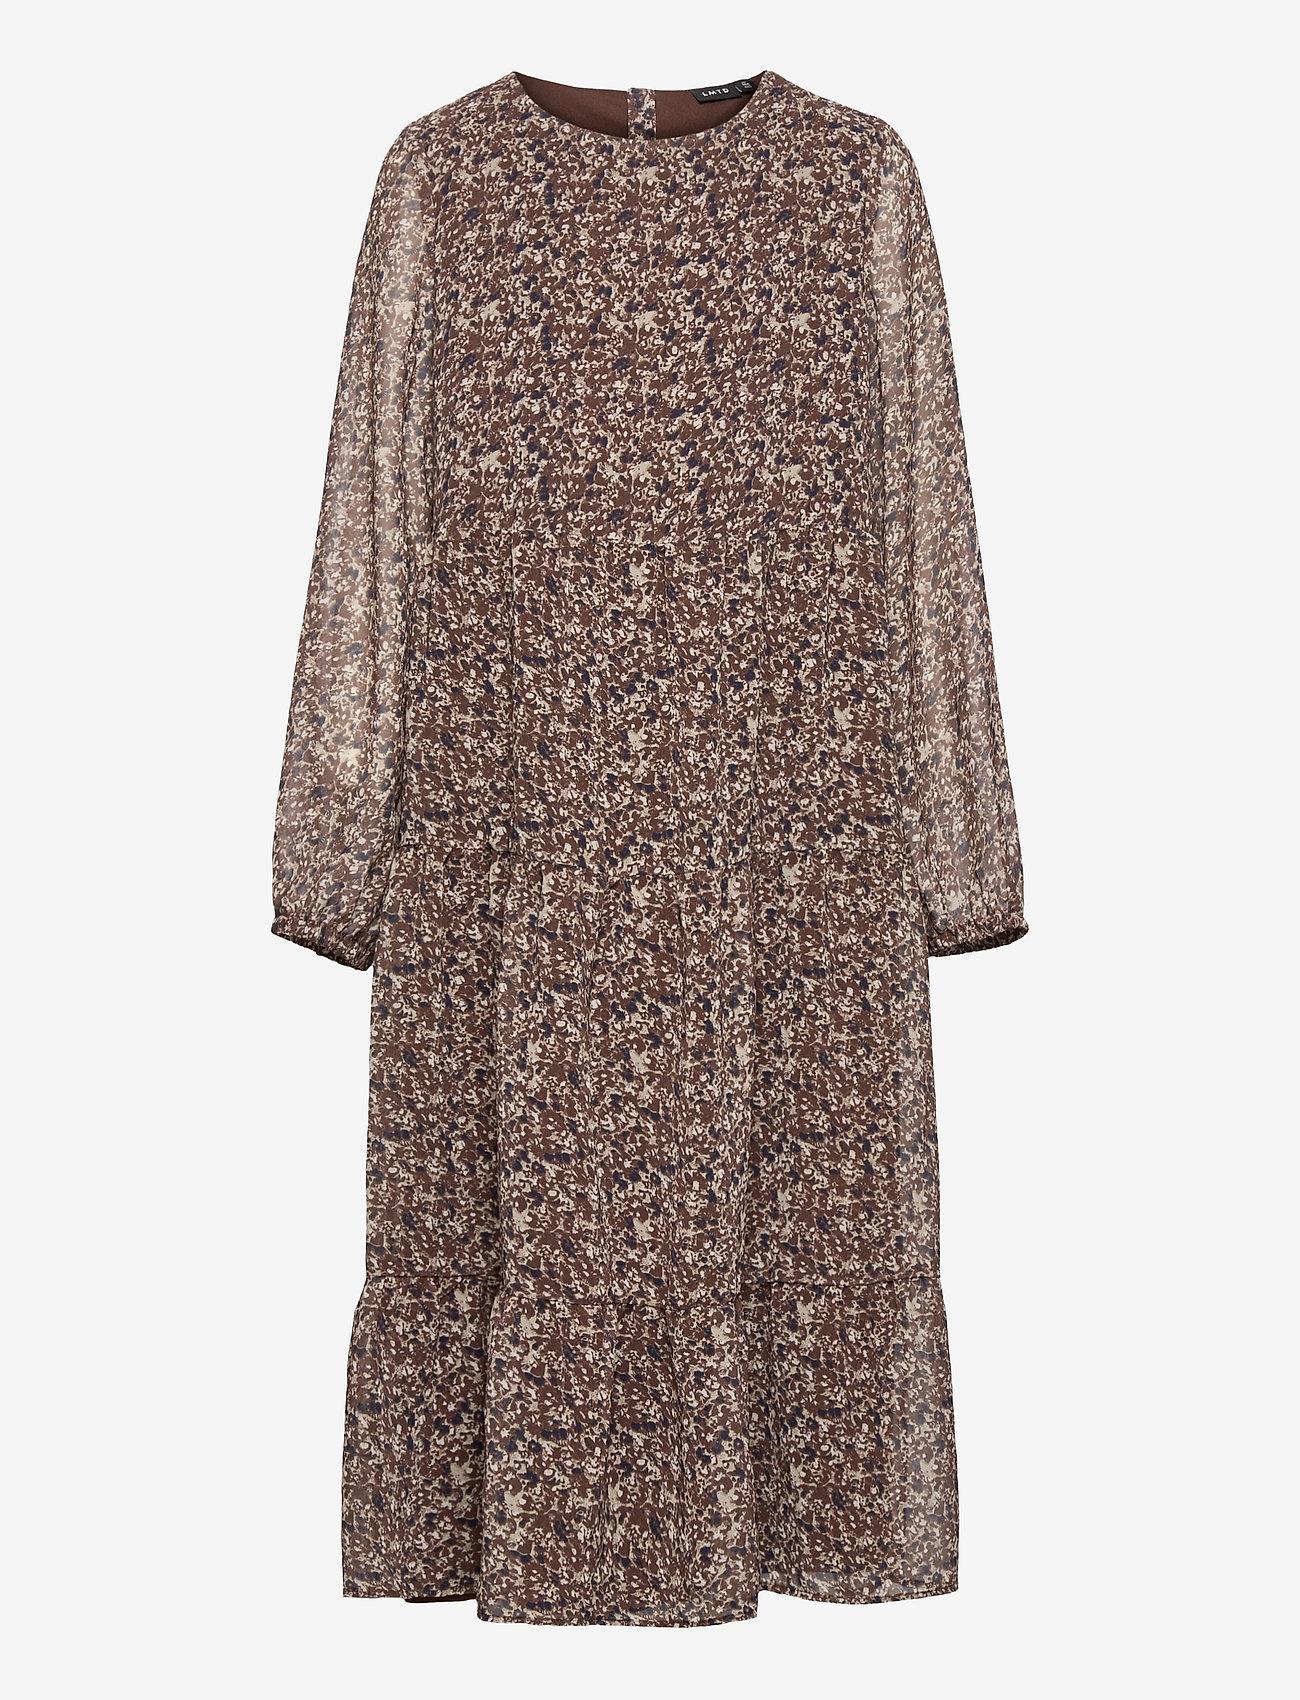 LMTD - NLFJINET LS LONG DRESS - kleider - chestnut - 0